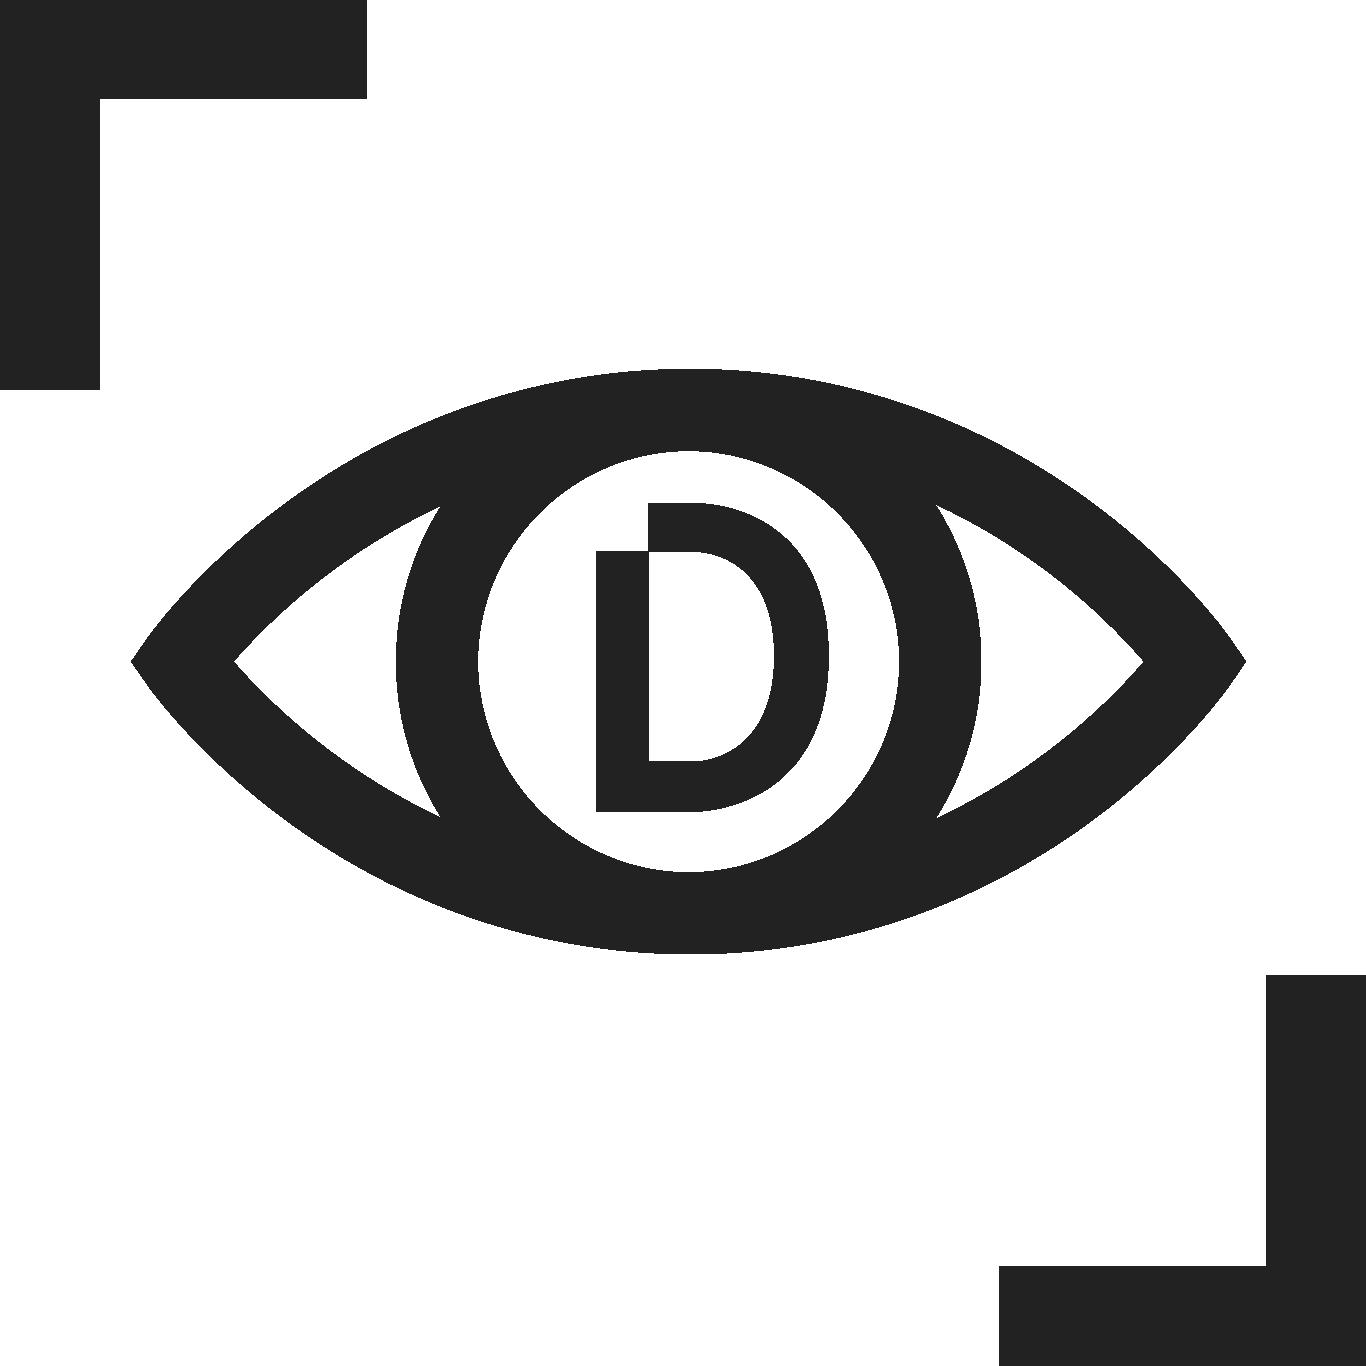 vizia-ikona